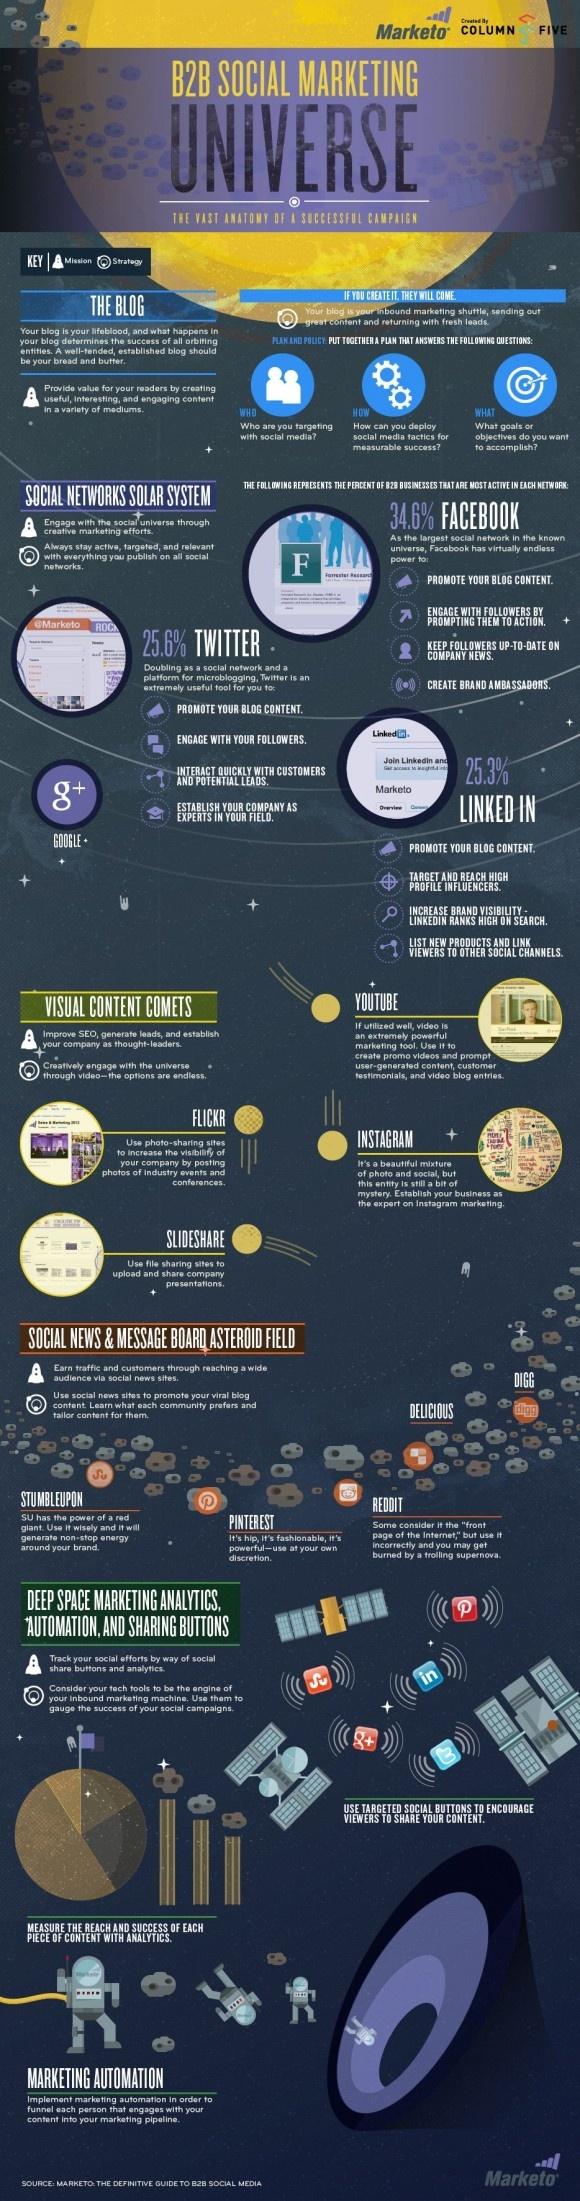 Infographie : L'univers du Social Marketing B2B | Antislash by TBWA\Corporate